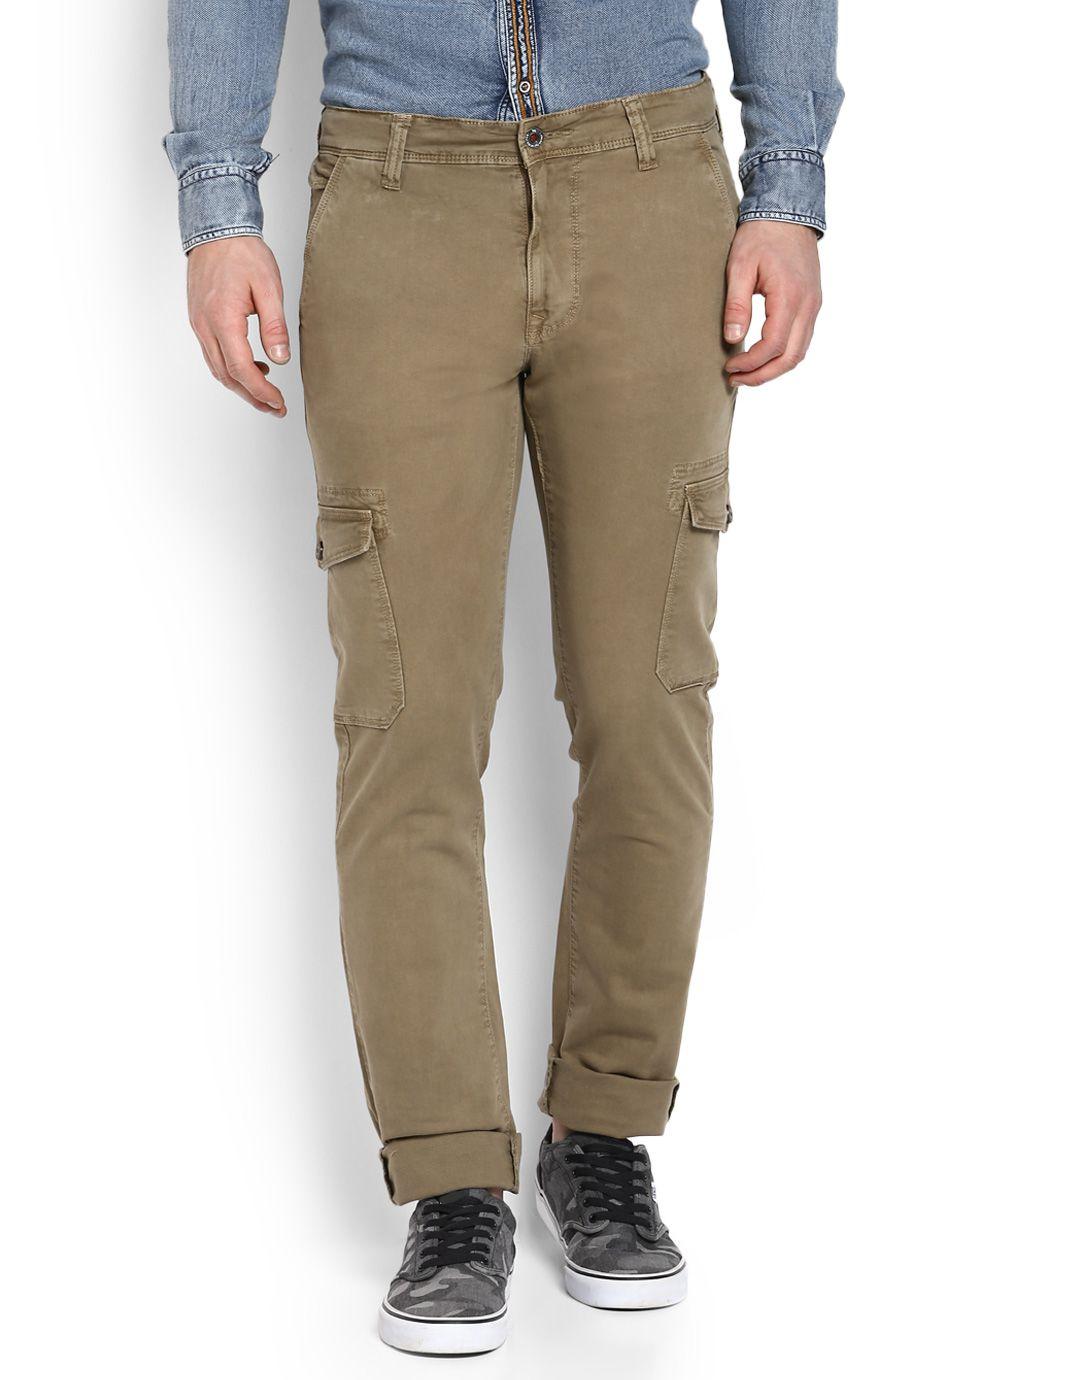 LAWMAN pg3 Khaki Fit Flat Trousers